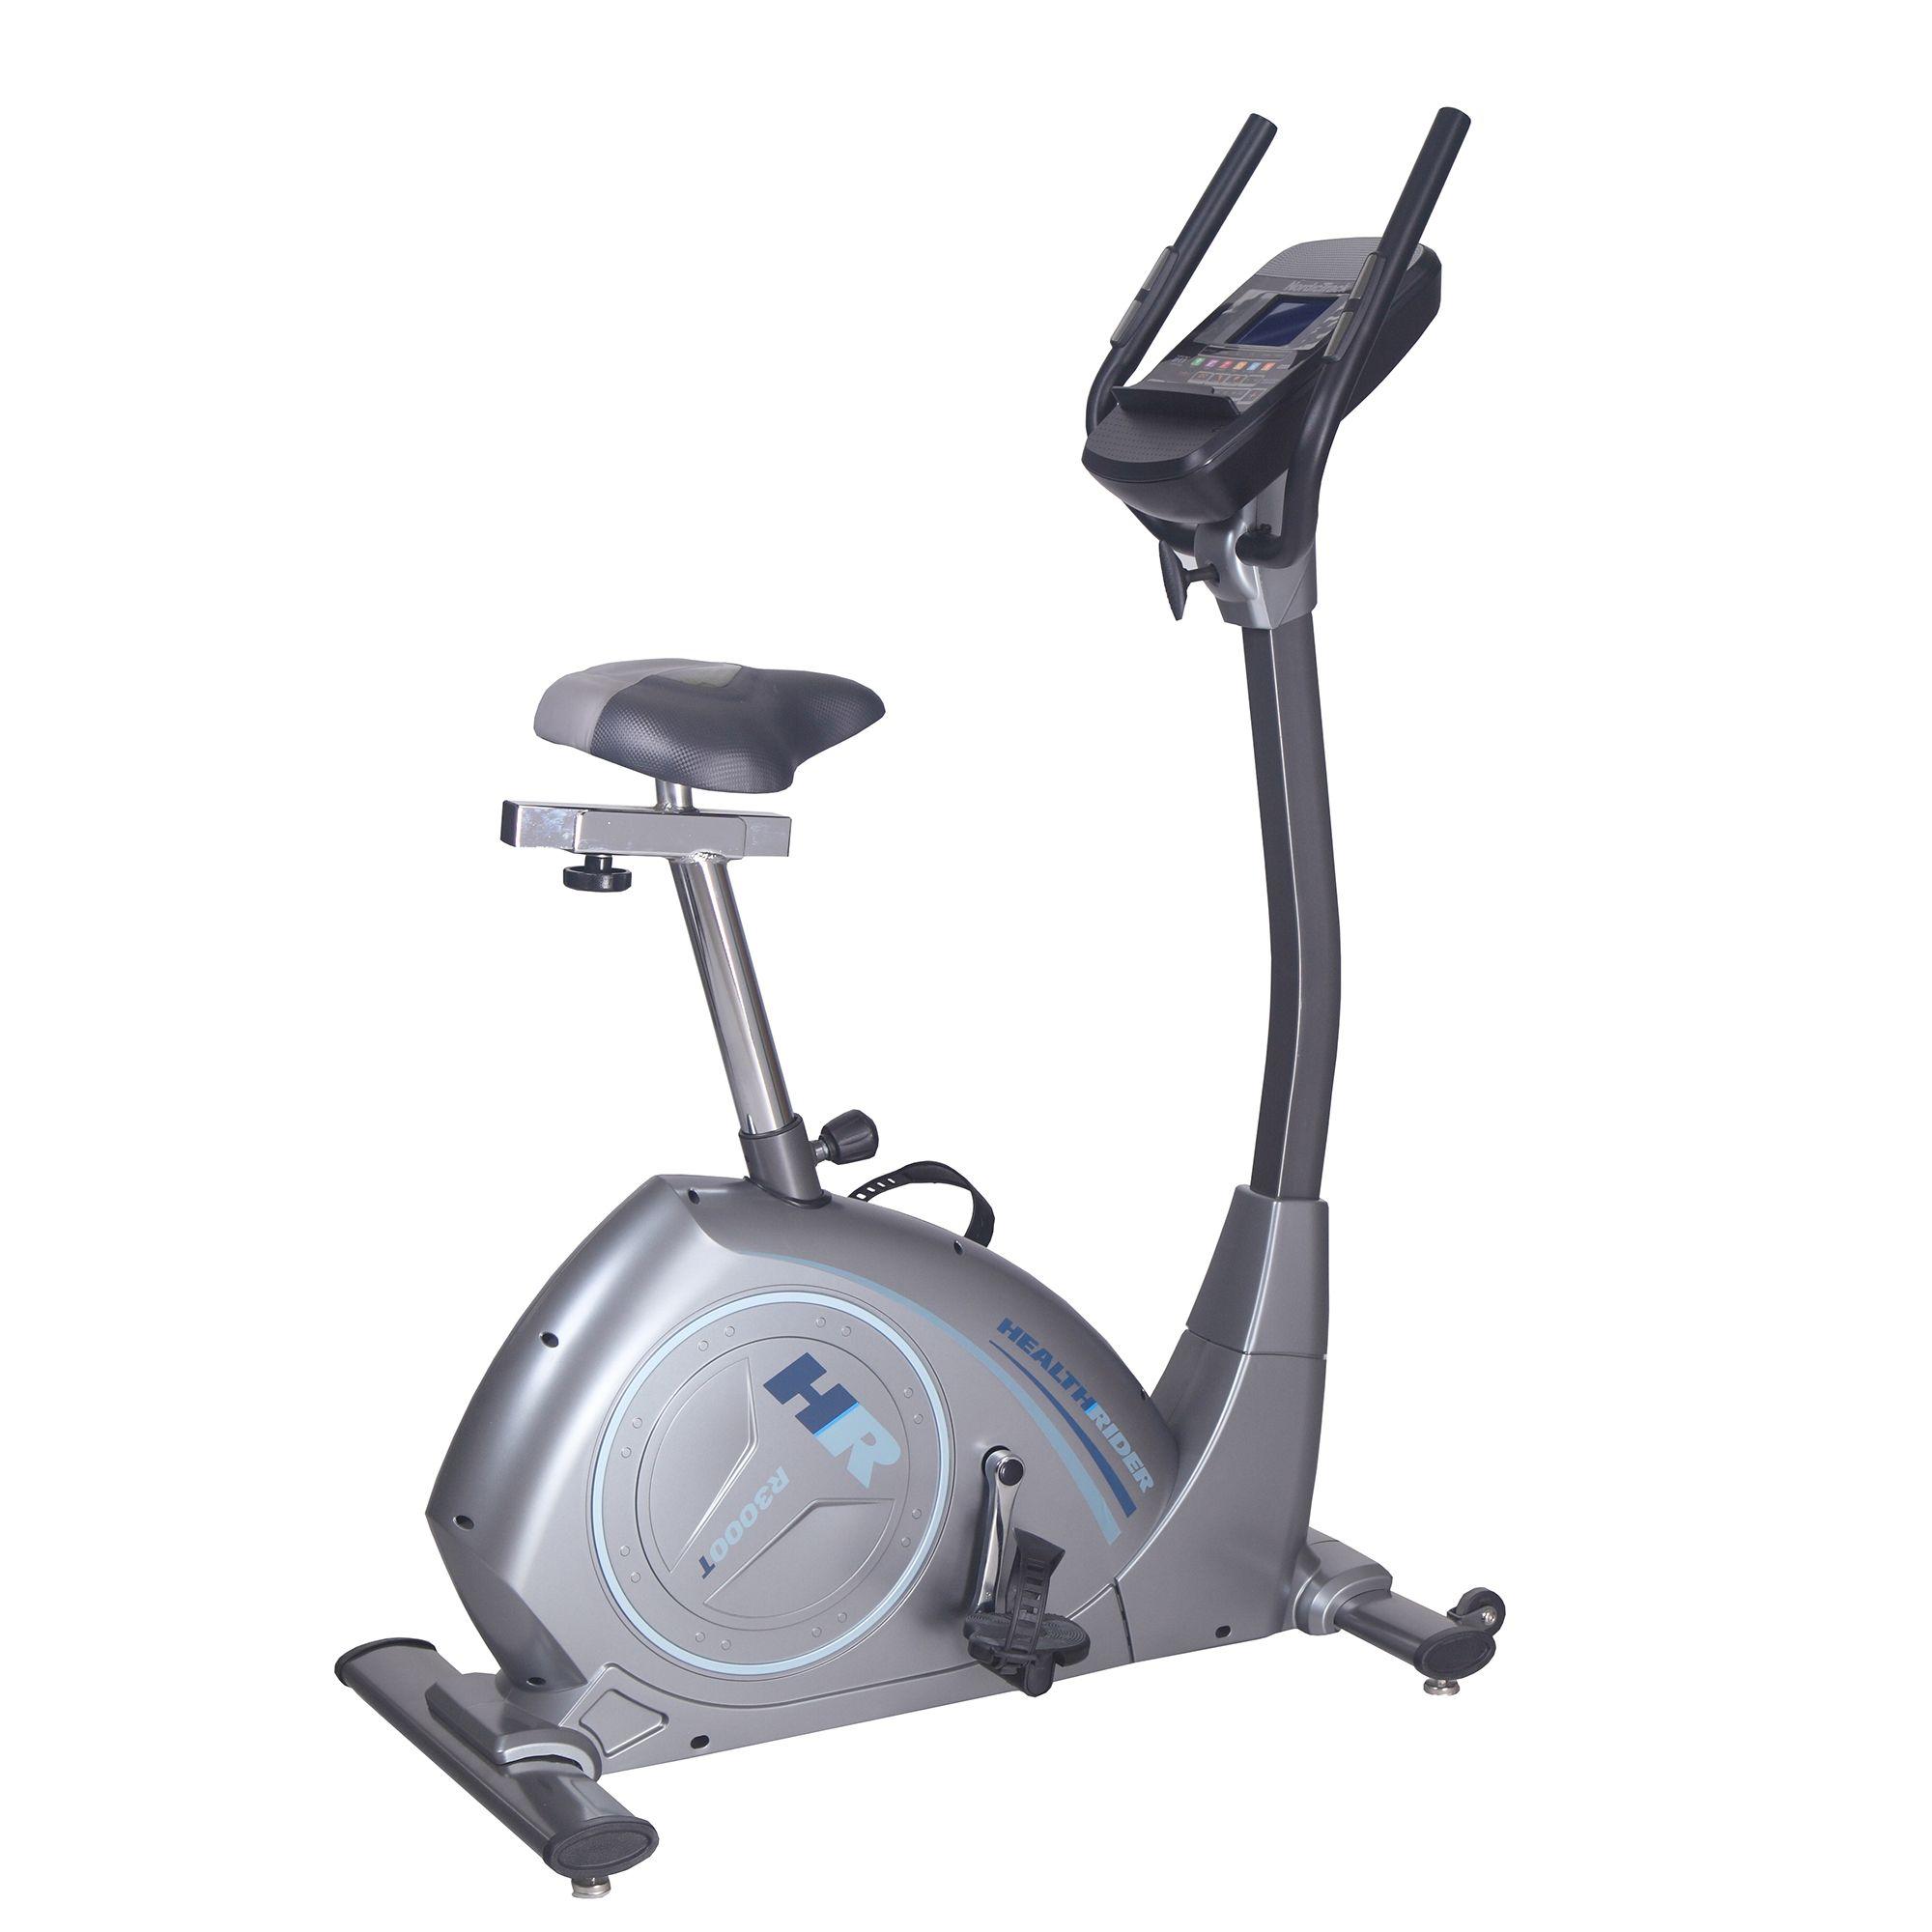 HealthRider Premium Complete Cardio Package - Sweatband.com